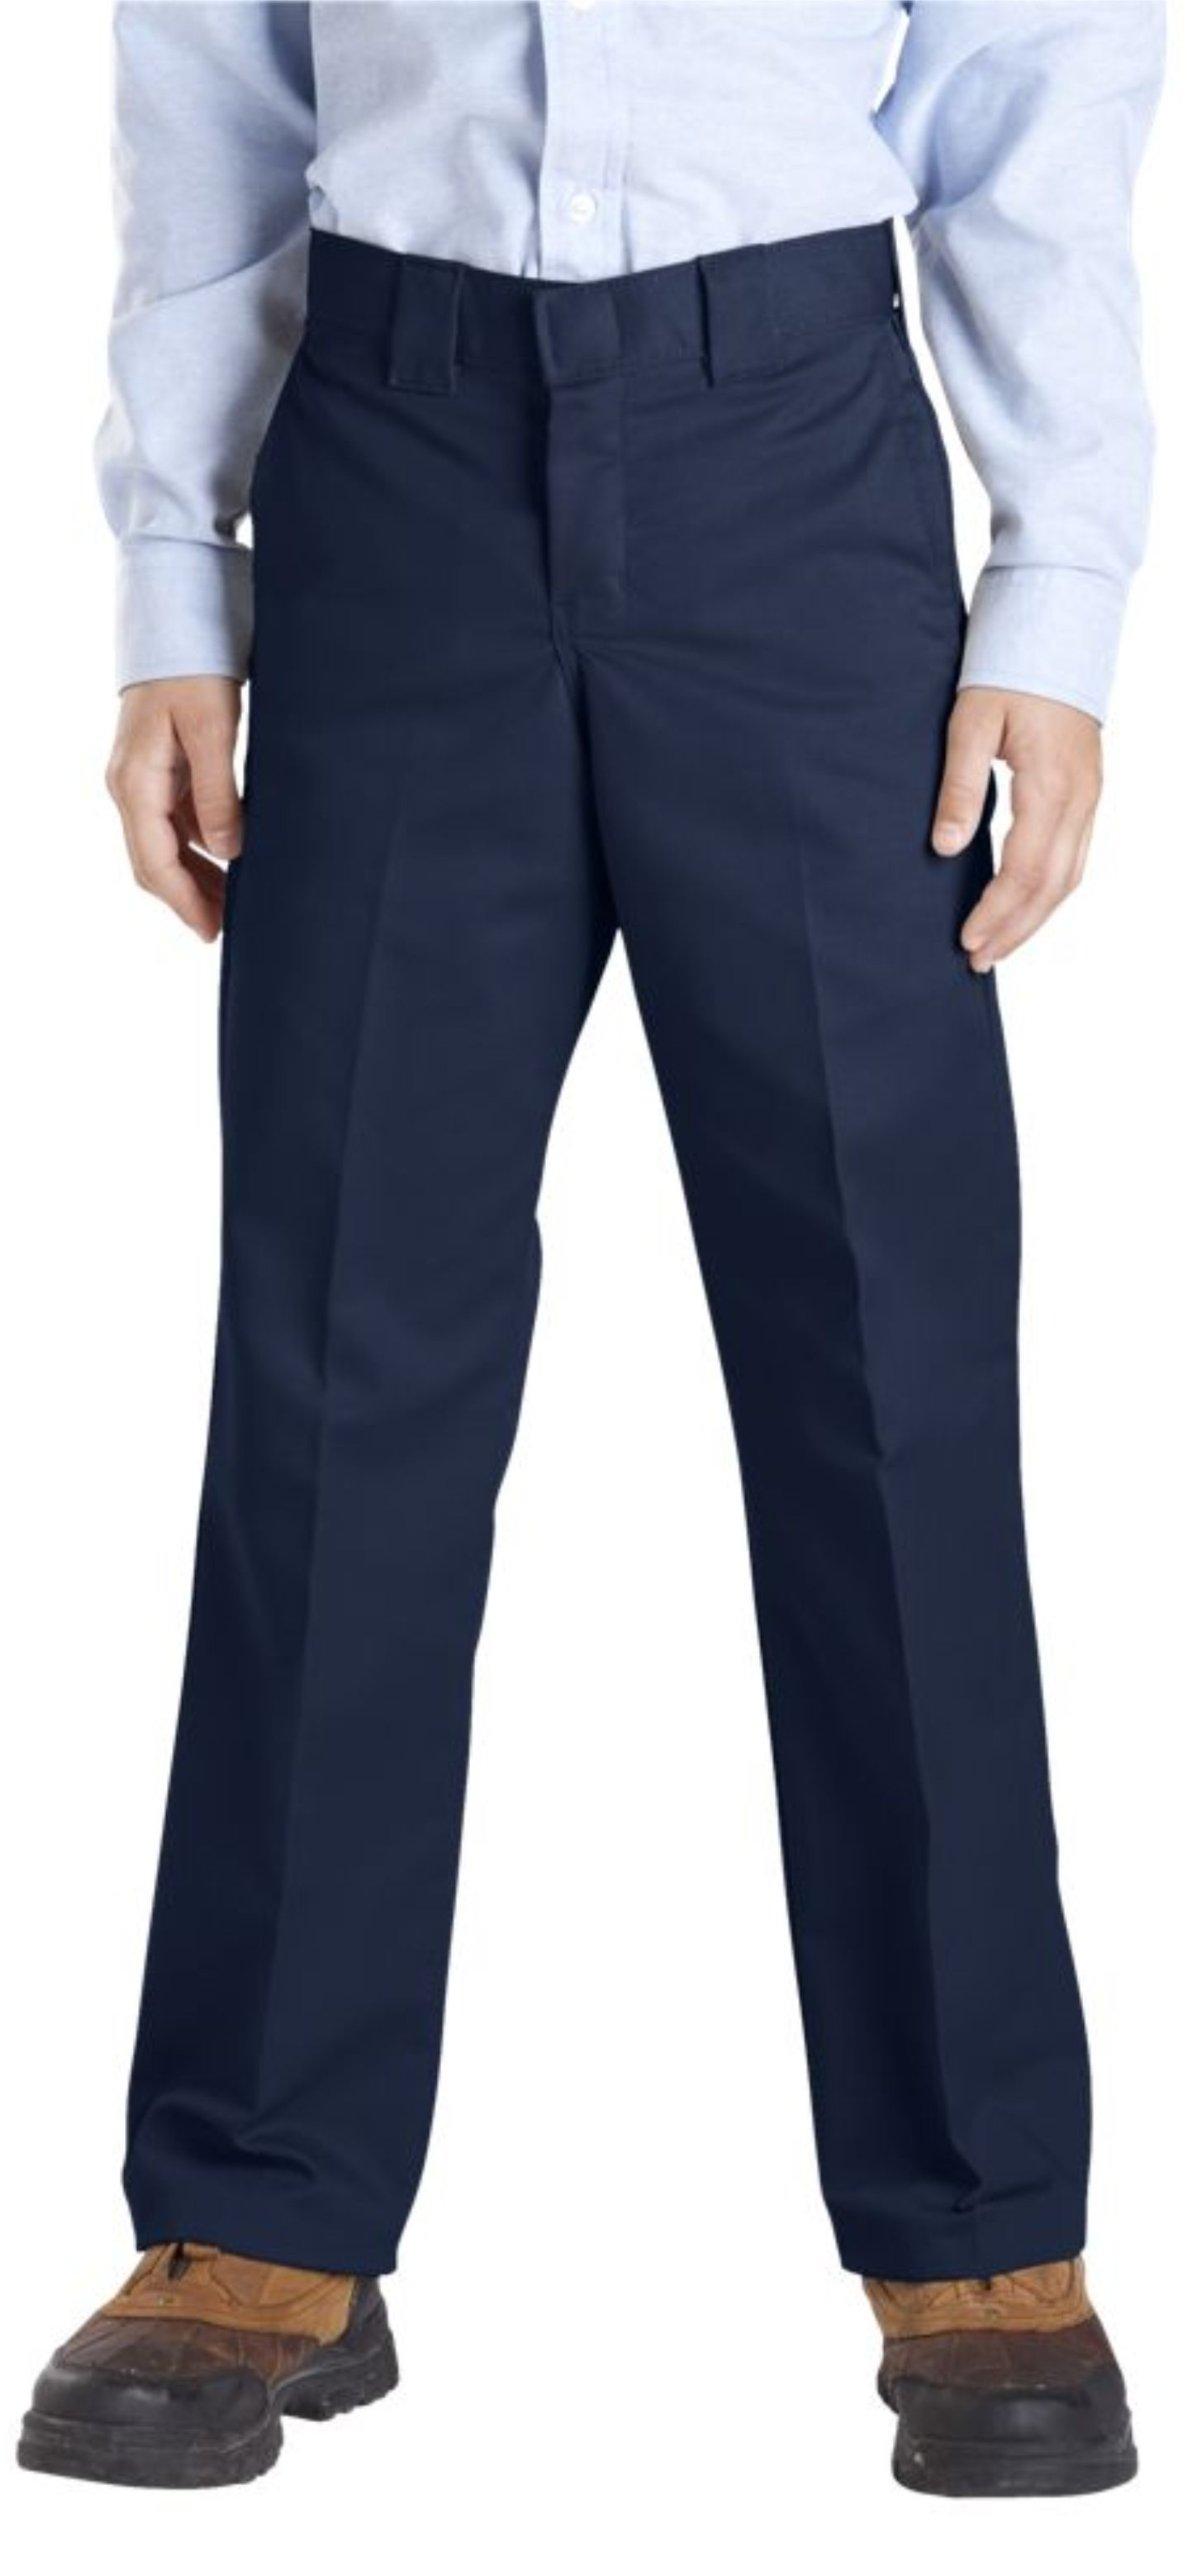 Dickies QP873 Boys Slim Straight Pant-DARK NAVY-12